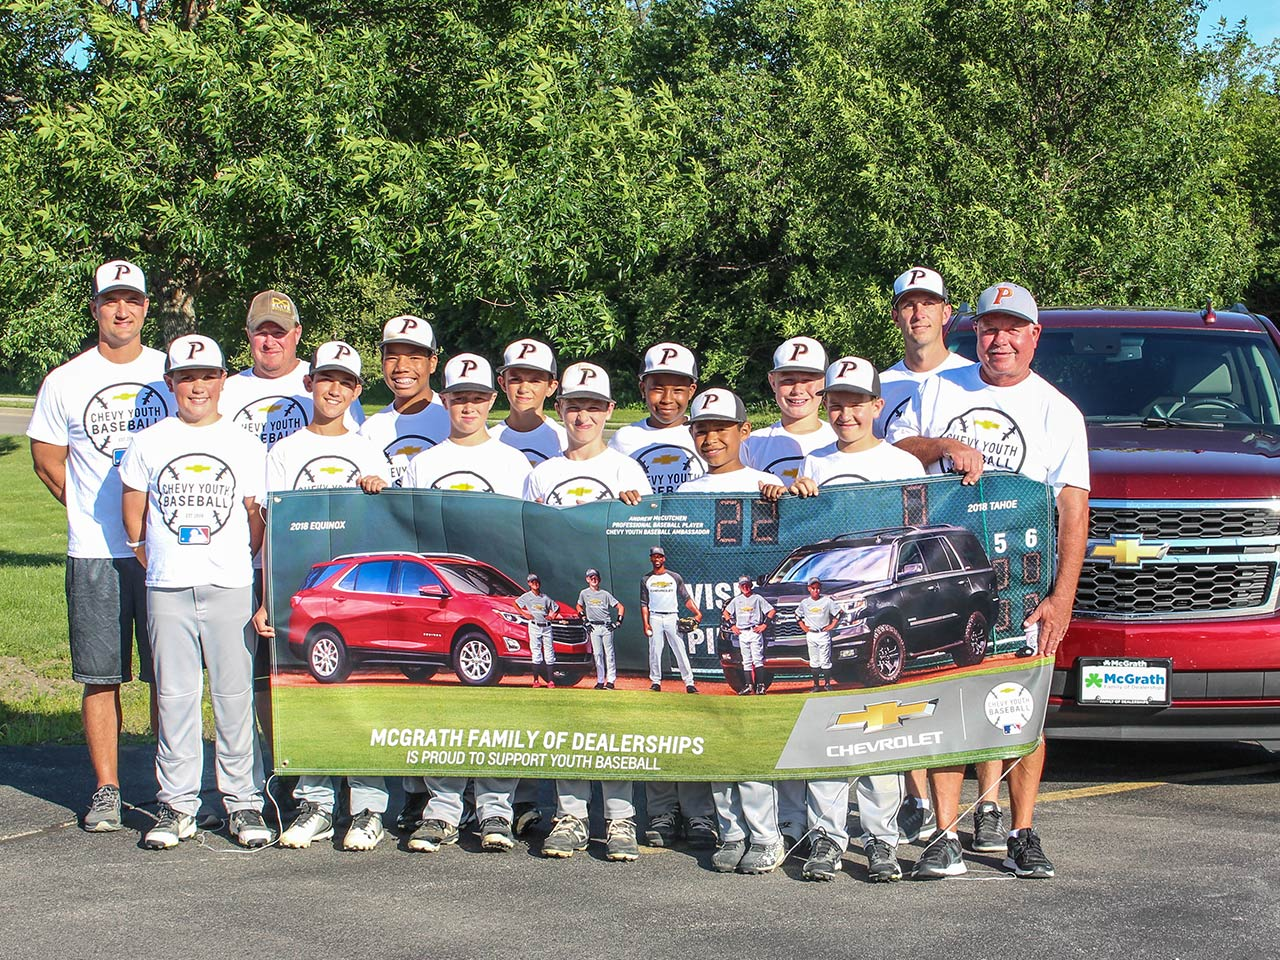 About McGrath Auto Group in Cedar Rapids | Iowa Chevrolet, RAM, Kia